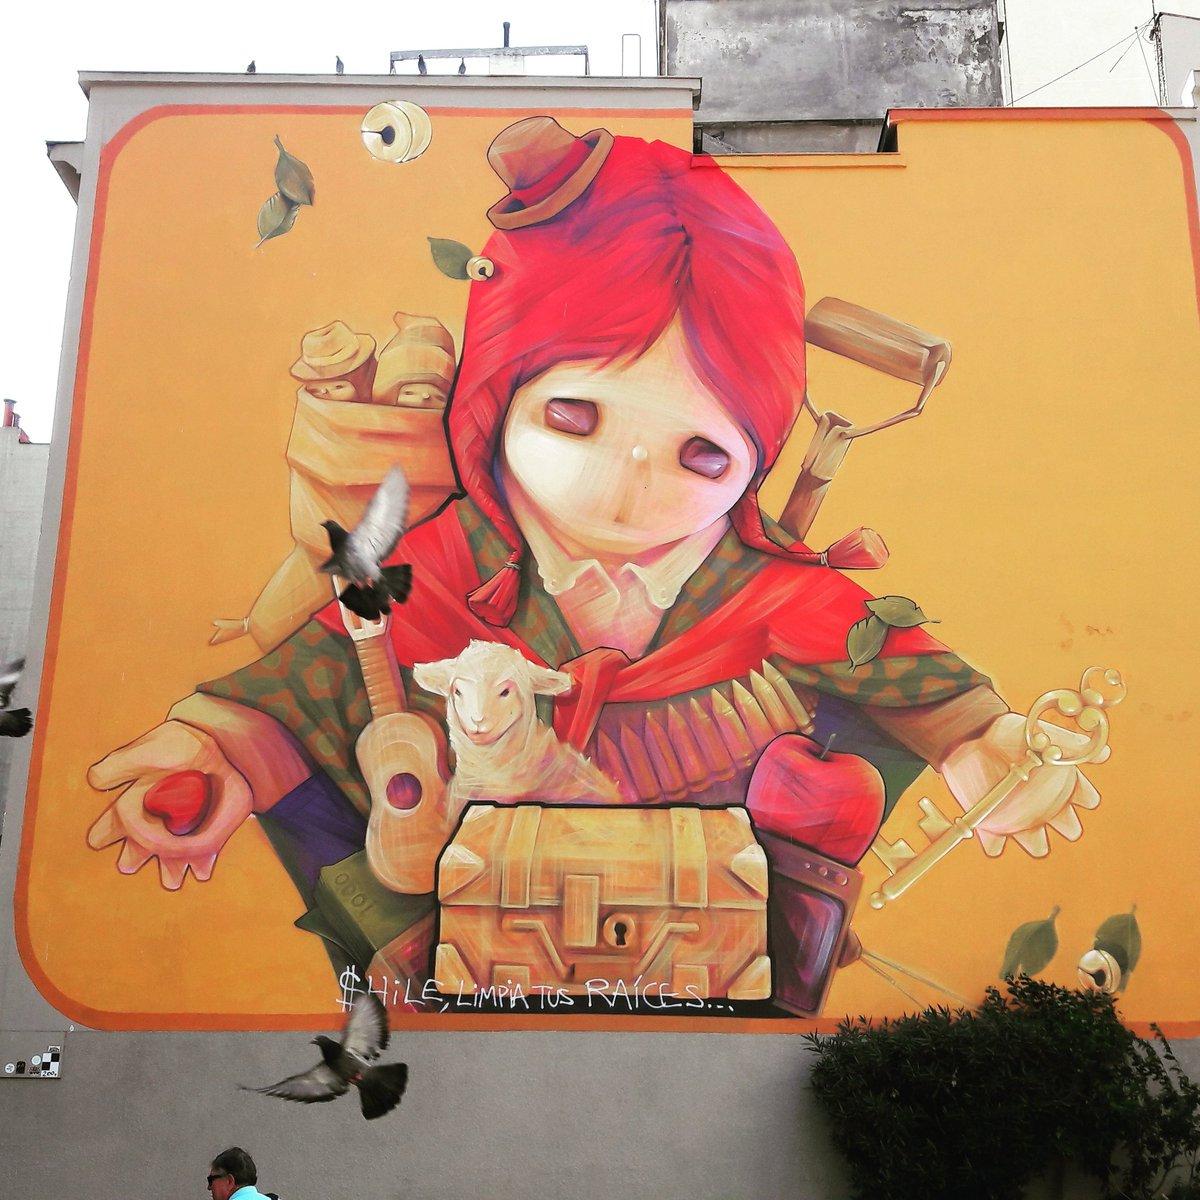 Canon ! Mur #inti  #chili #santiago à la sortie du métro.  #urbanart #arturbain #streetart #muralisme #streep #streepart<br>http://pic.twitter.com/Q7f1hROQDy